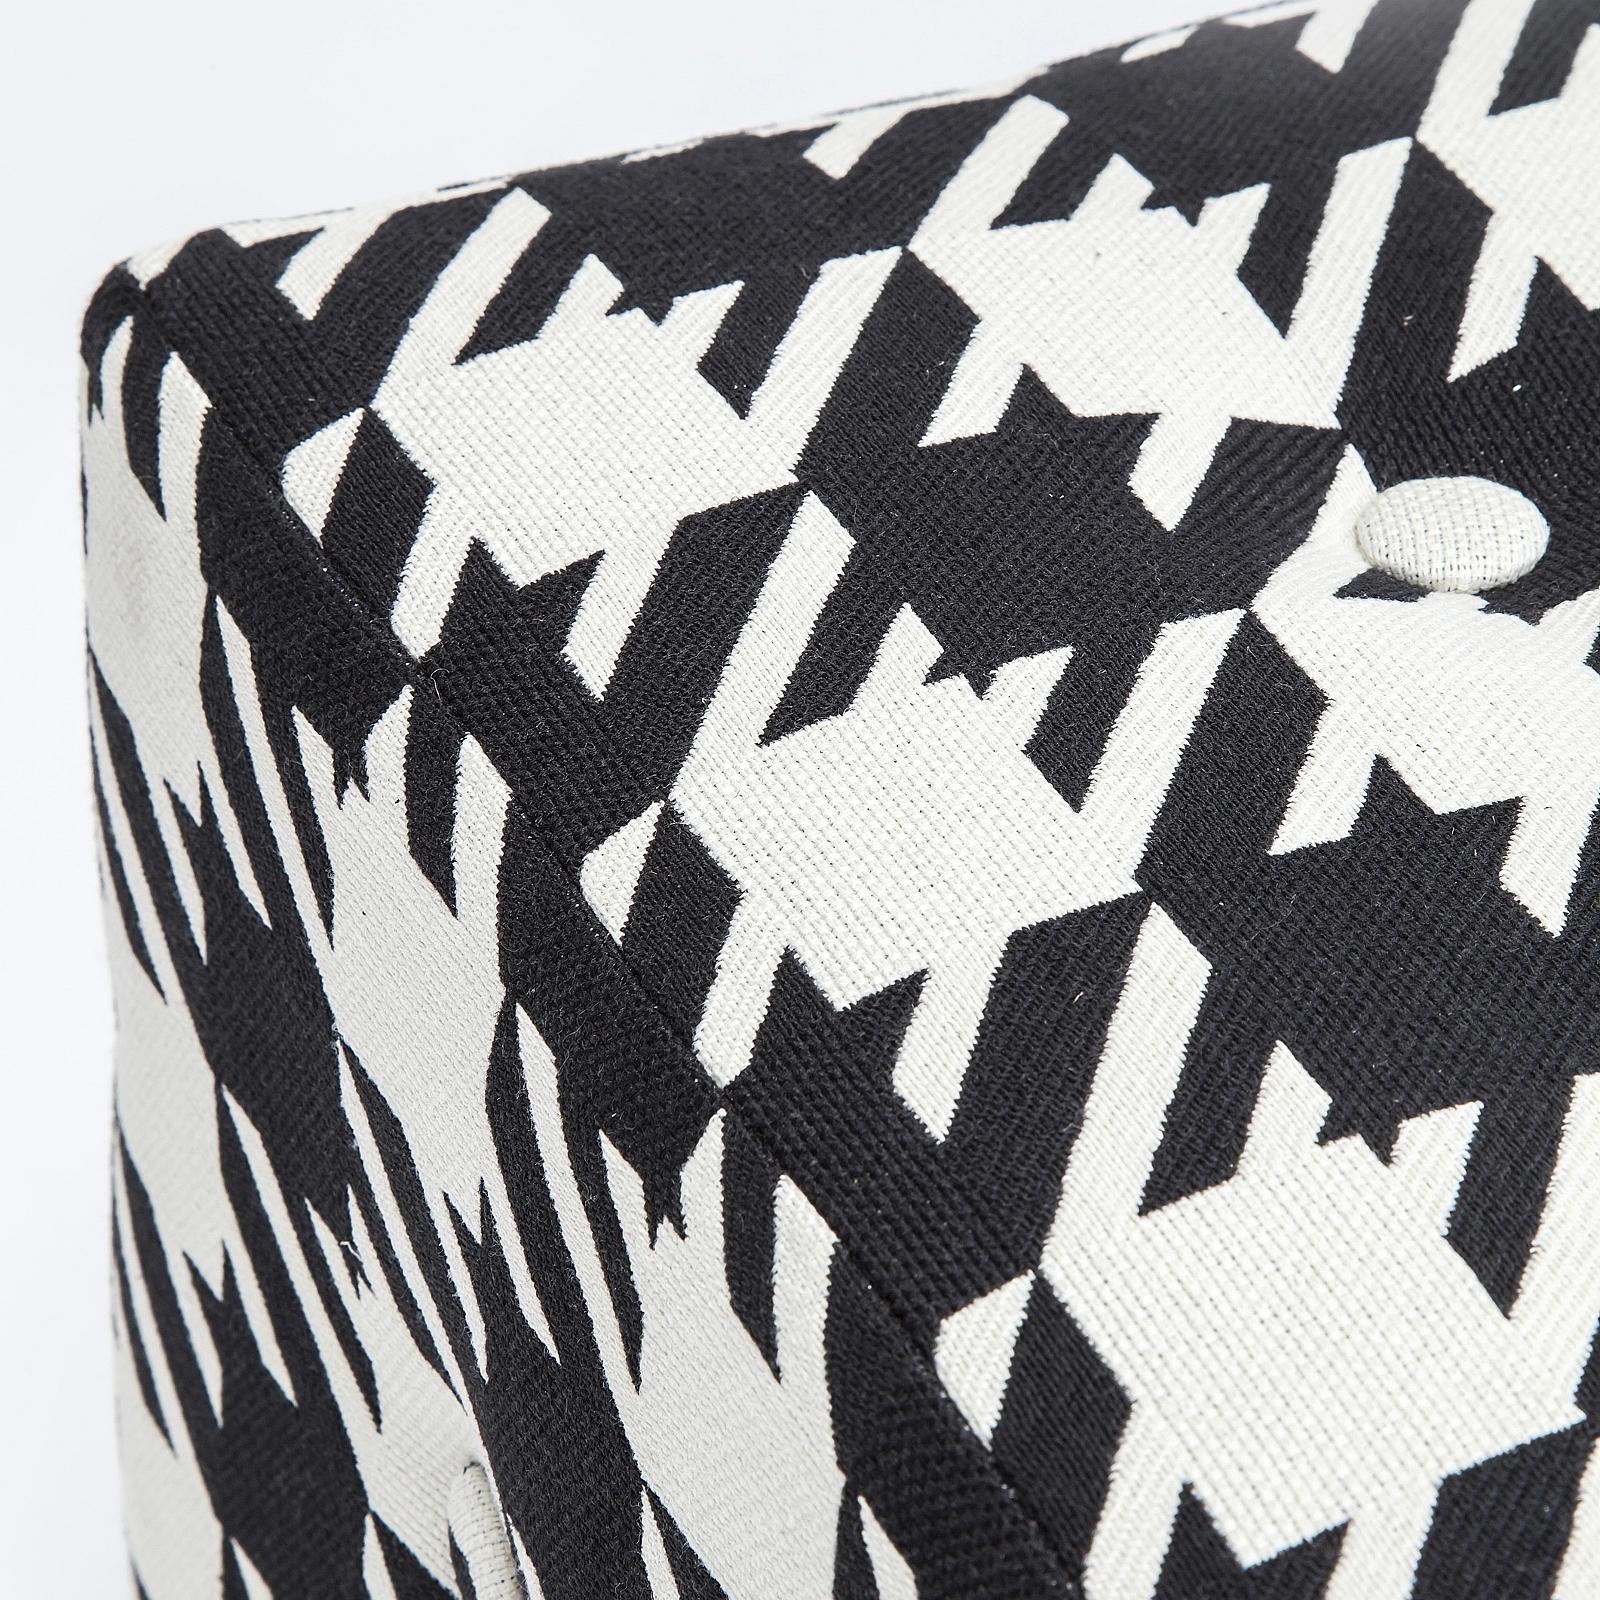 design sitzw rfel josefa schwarz wei es pepita muster. Black Bedroom Furniture Sets. Home Design Ideas